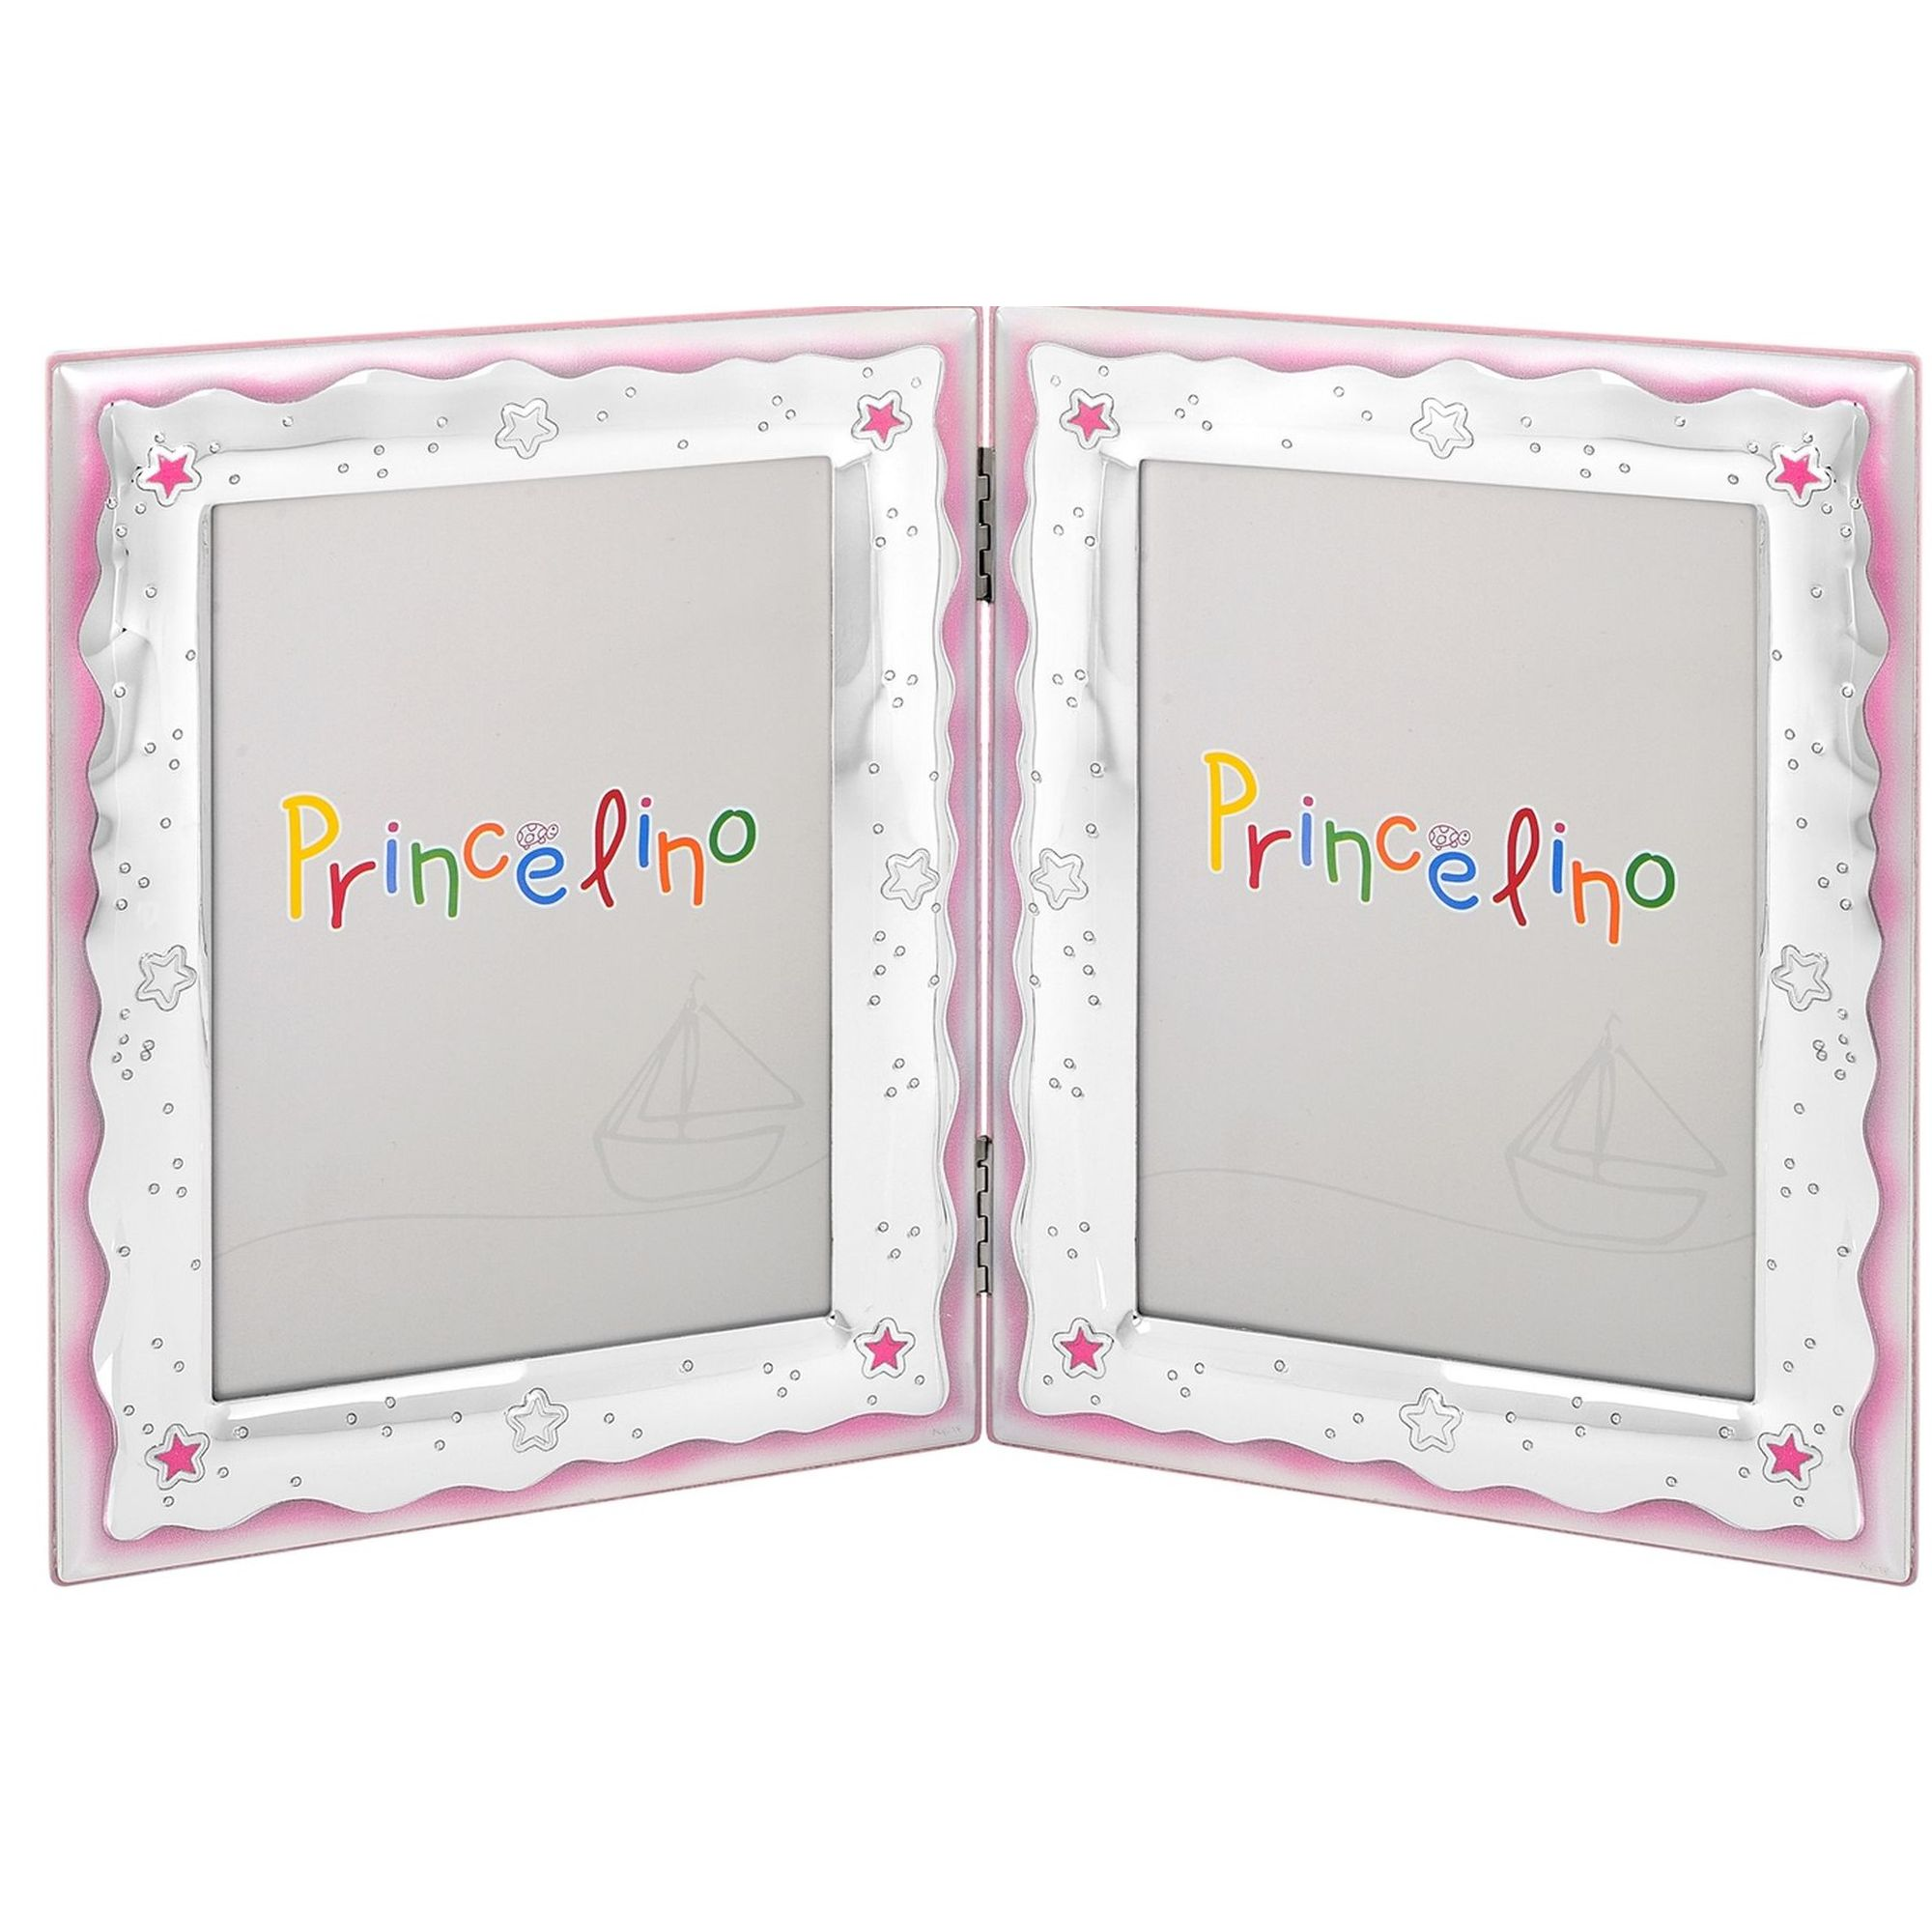 Princelino Παιδική Διπλή Κορνίζα Για Κορίτσι MA-143-2B-RR